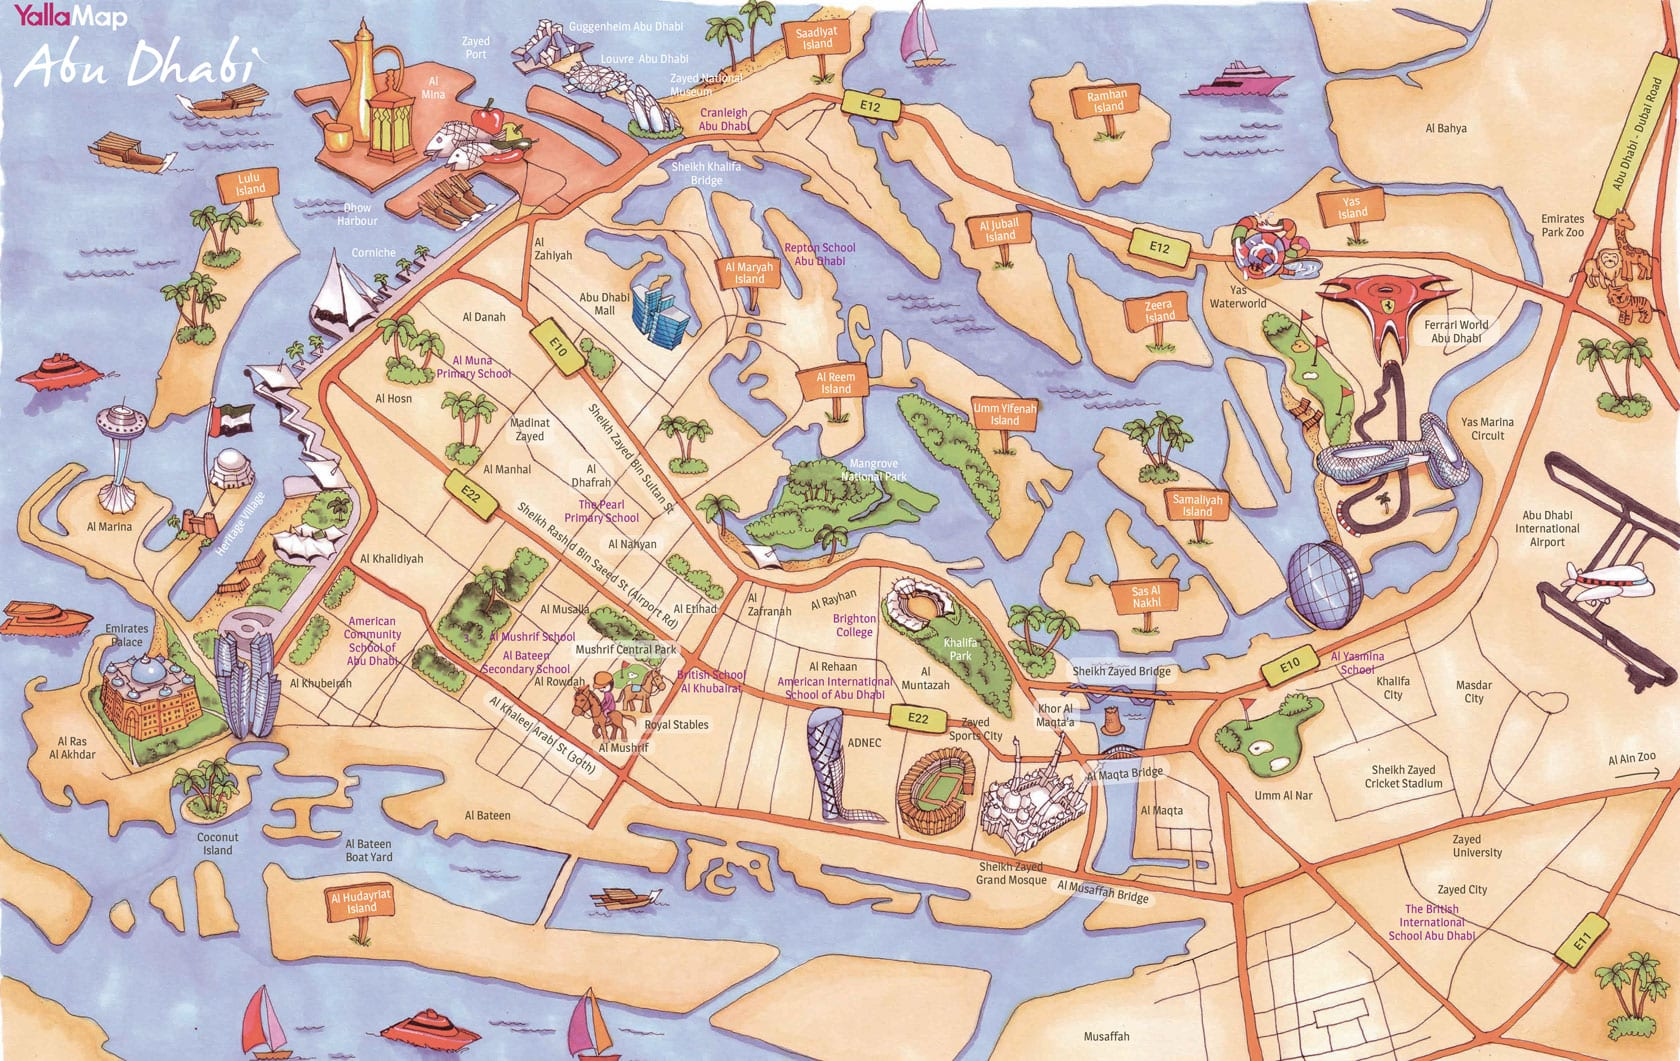 Yalla Abu Dhabi Yalla Abu Dhabi Events Map Family Guide For - Al ain map